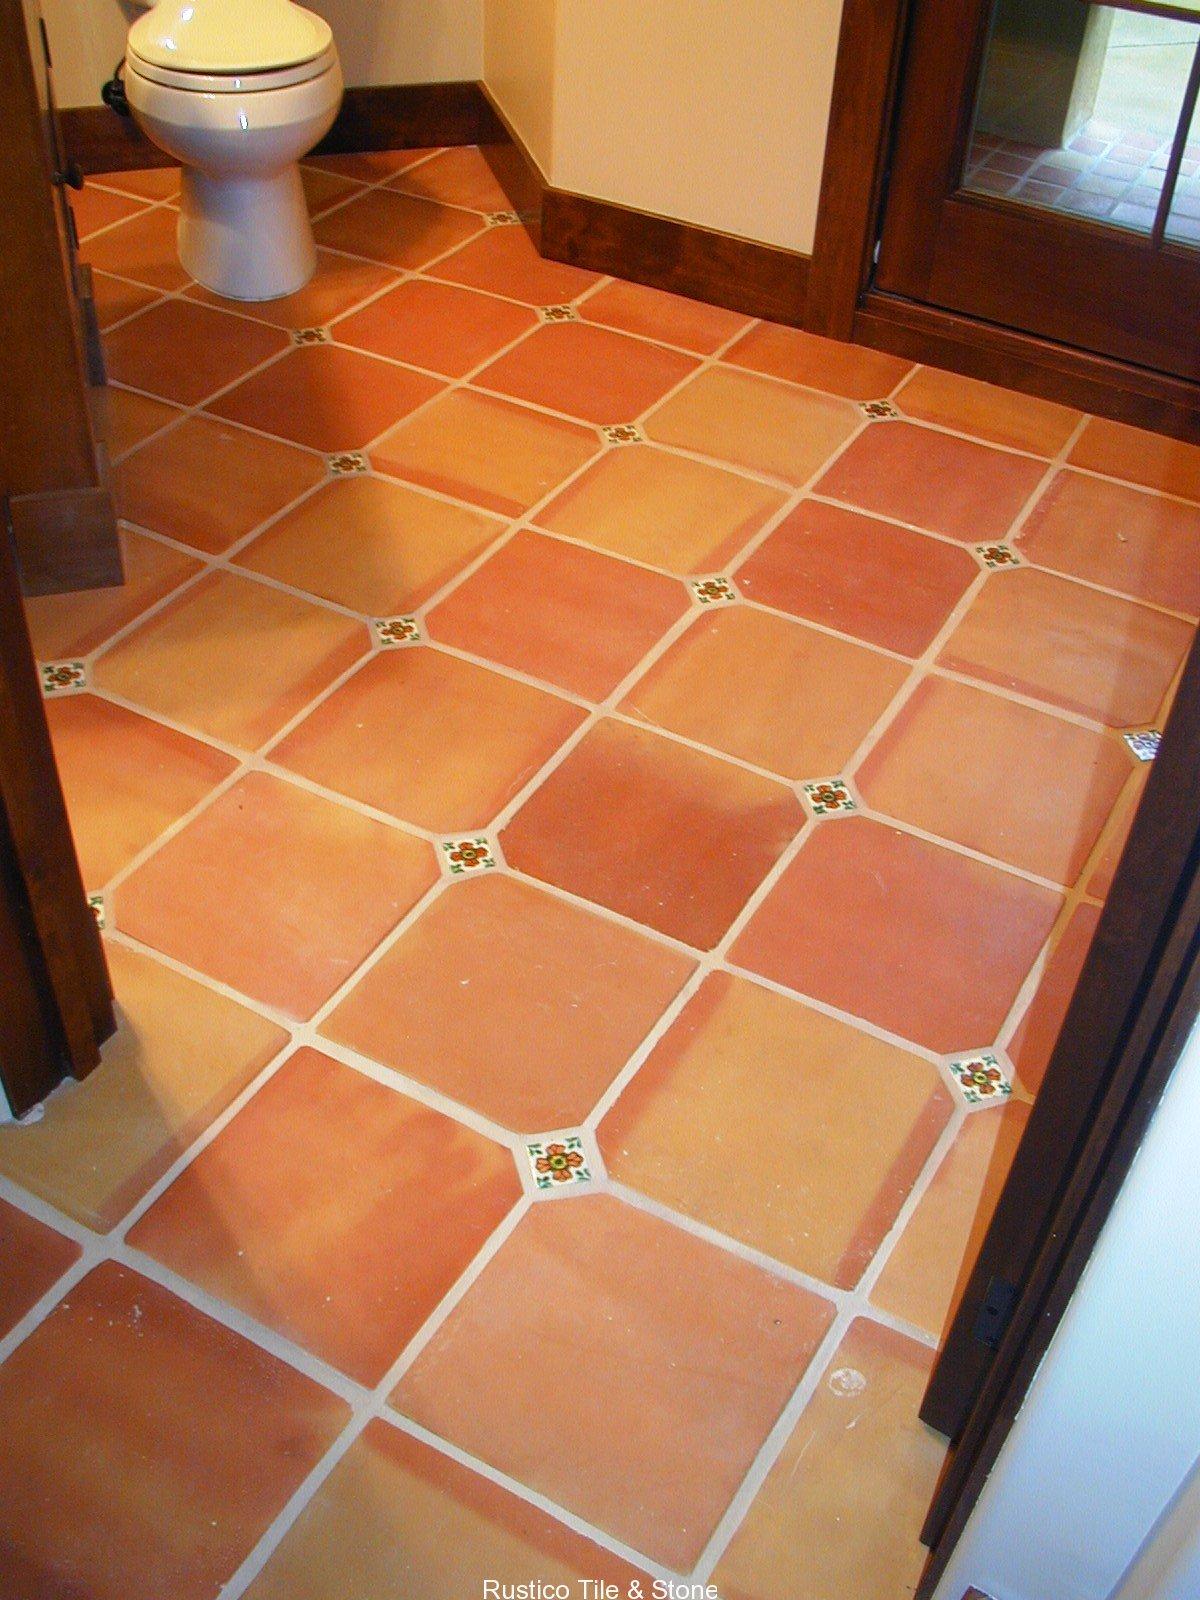 Beautiful Bathroom Stone Floor Tiles Shop in Lahore Pakistan